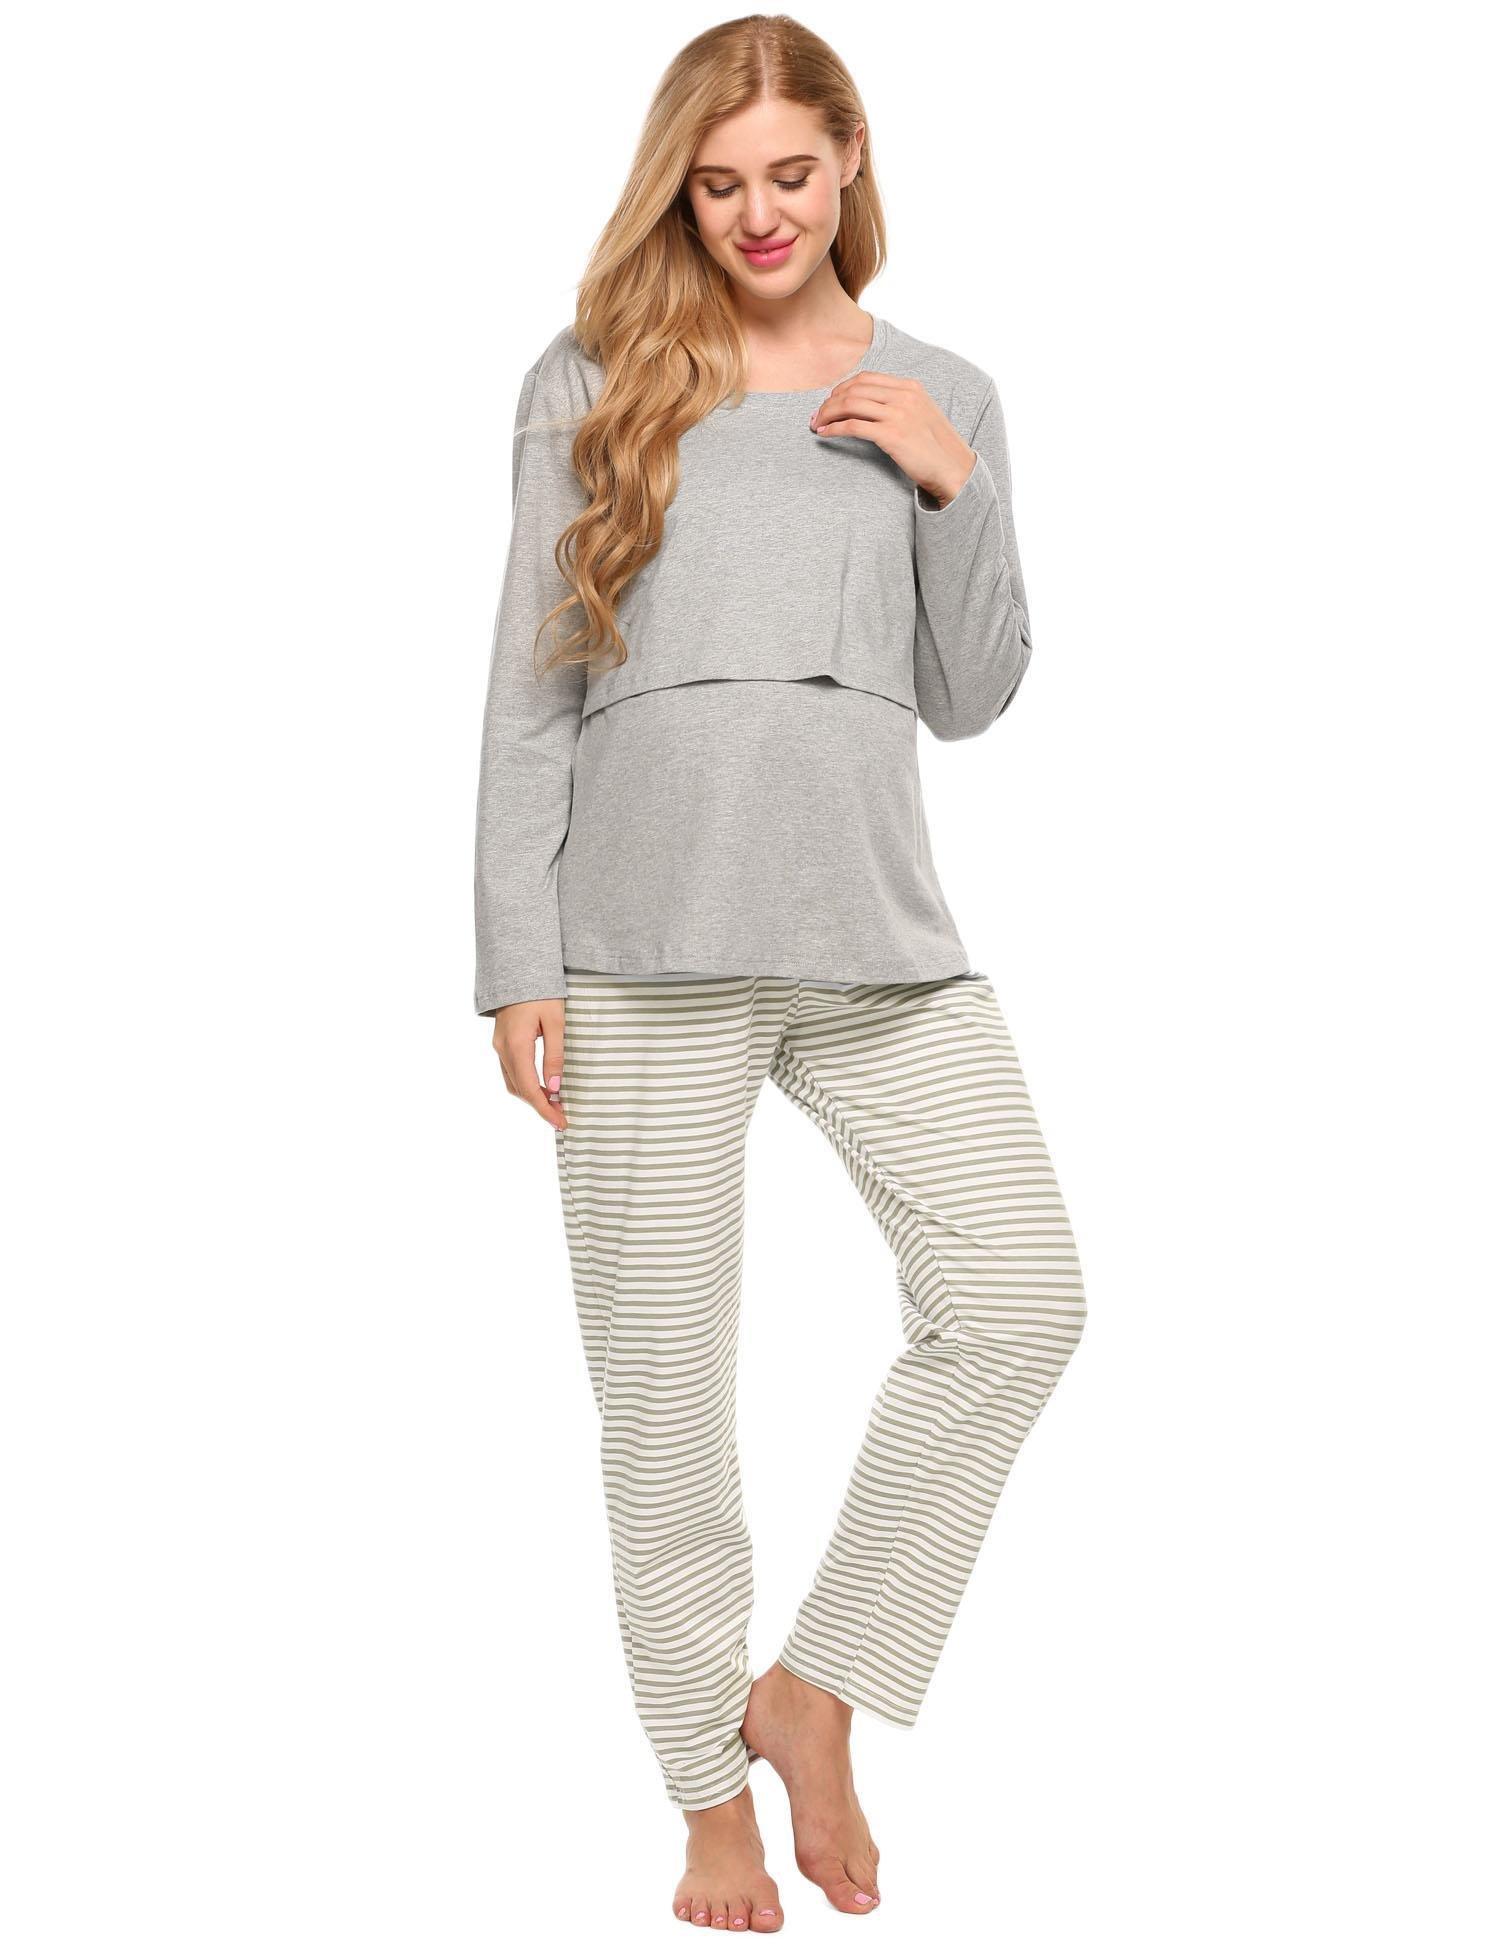 Ekouaer Women's Maternity Nursing Cotton Pajama Sets Breastfeeding Sleepwear, Style 2-grey, Medium-US L(14,16)